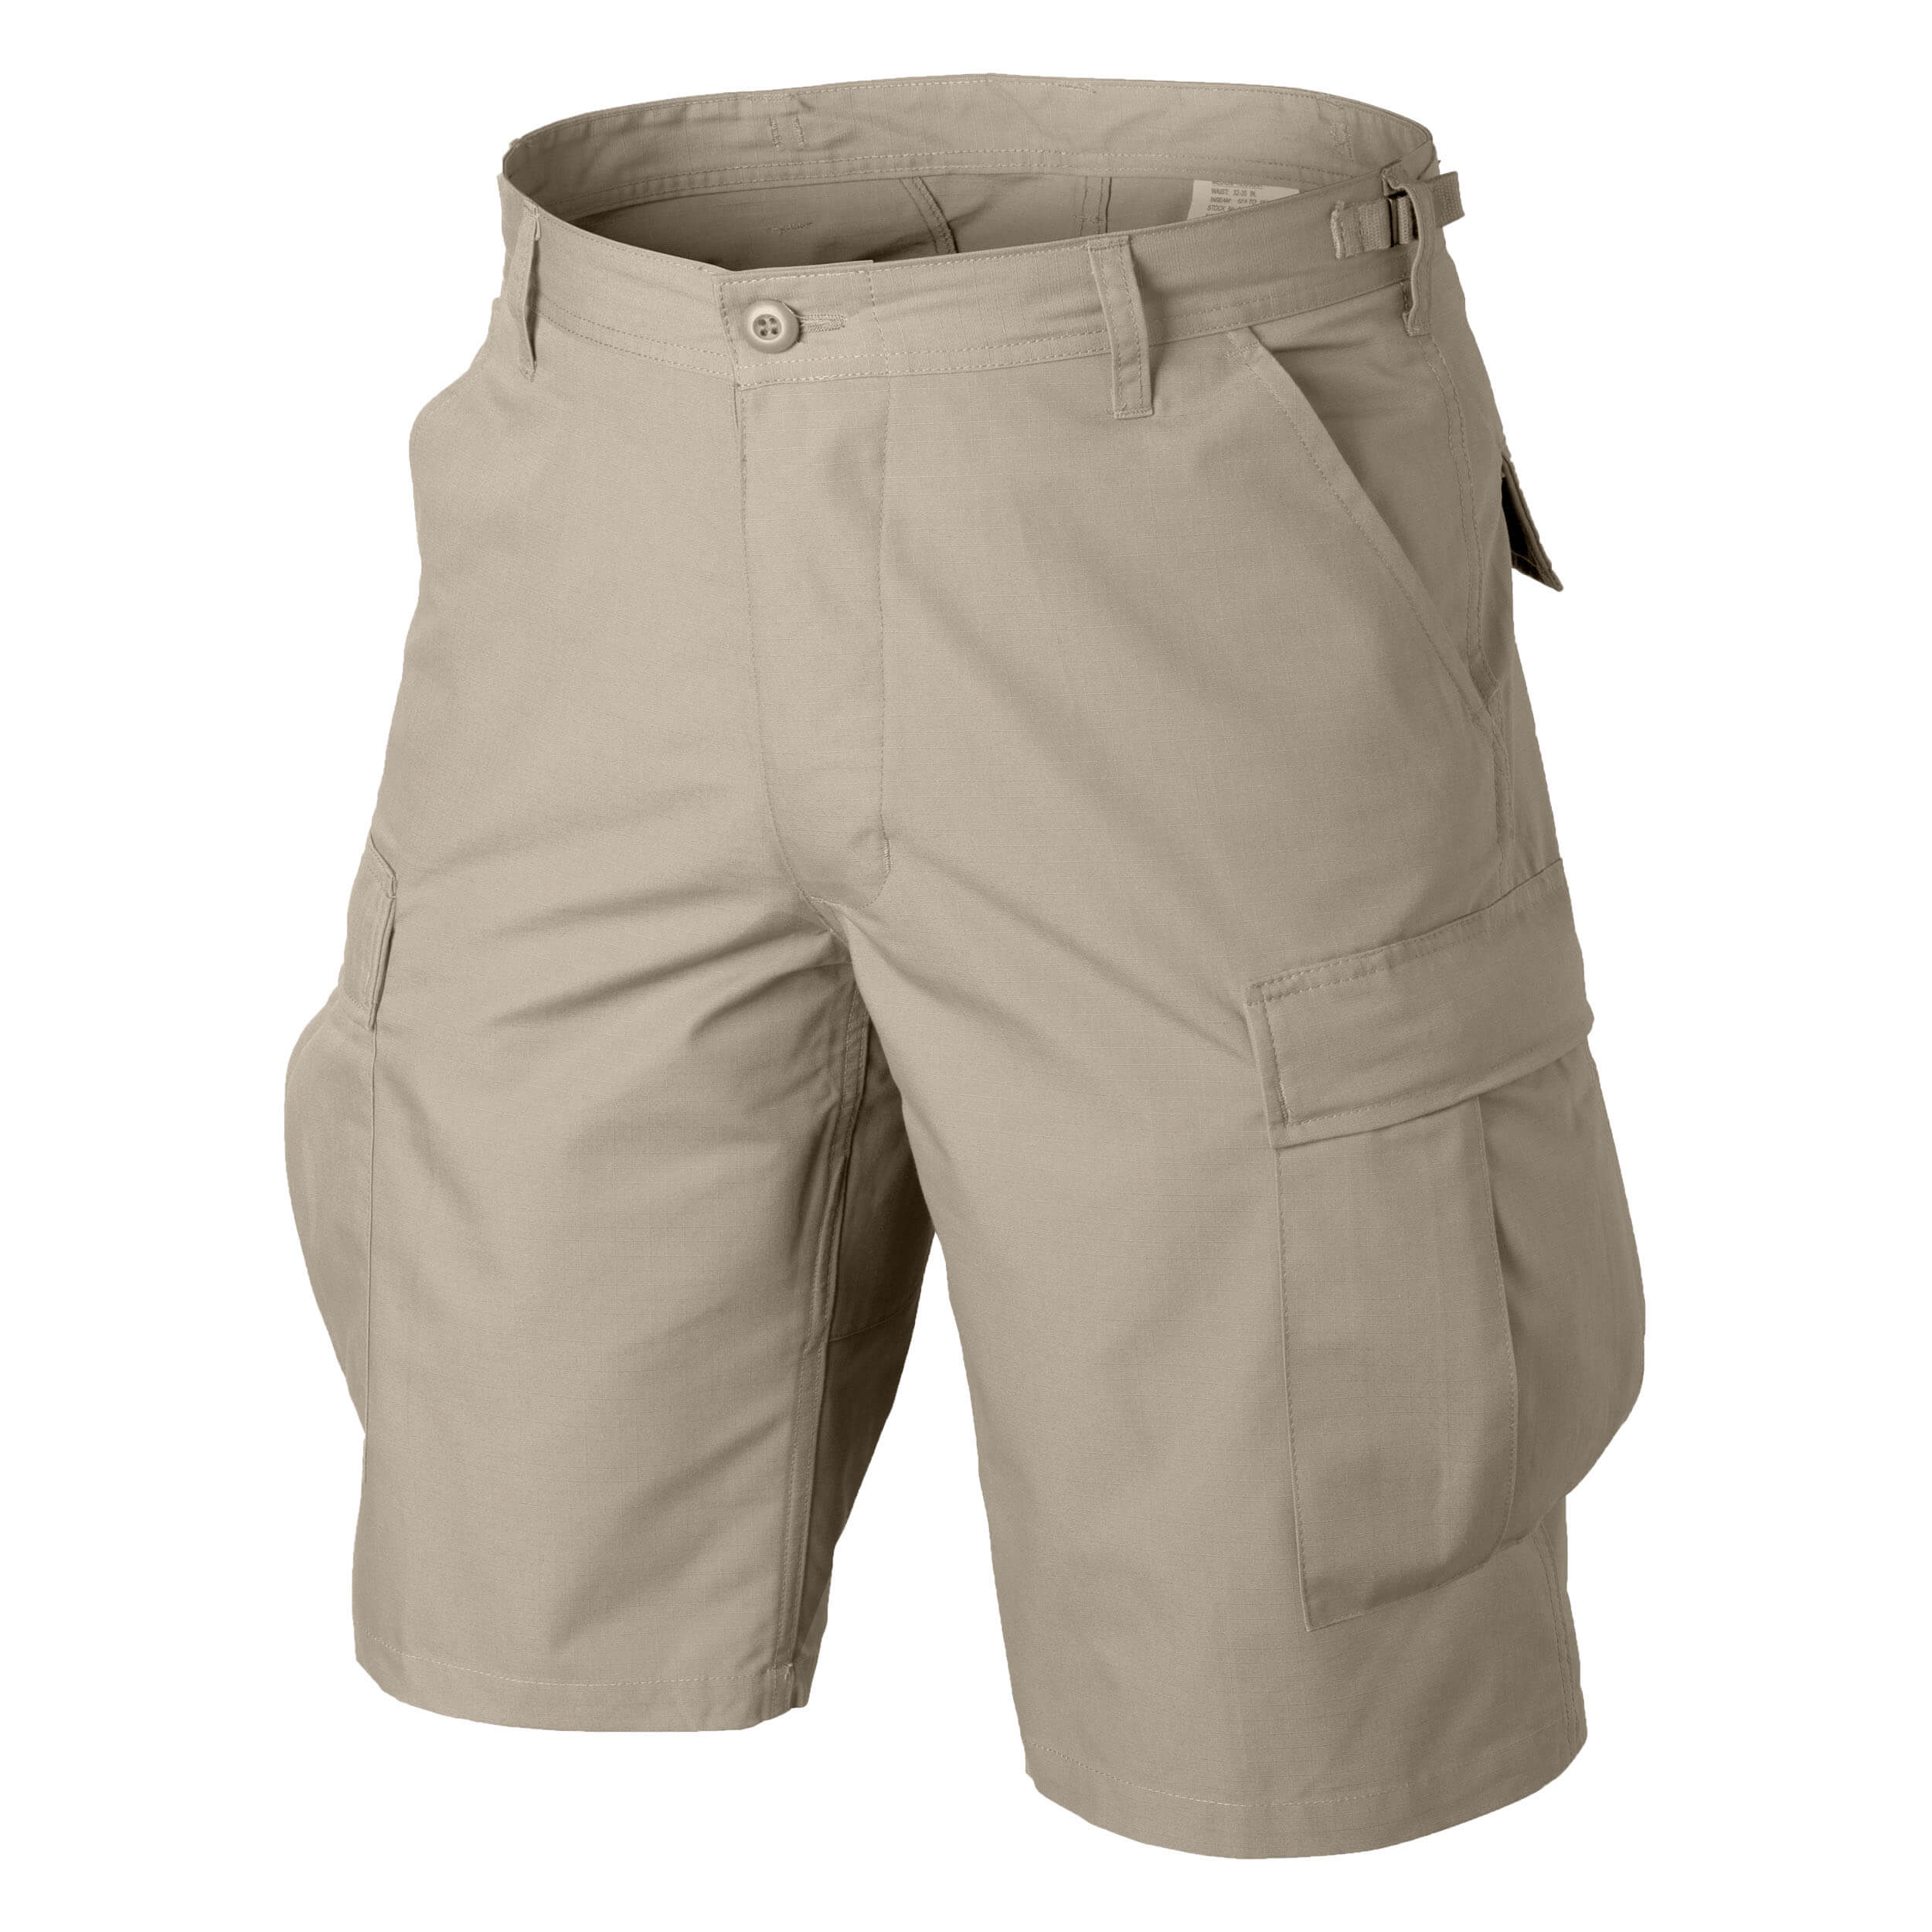 Helikon-Tex BDU Shorts -Cotton Ripstop- Khaki